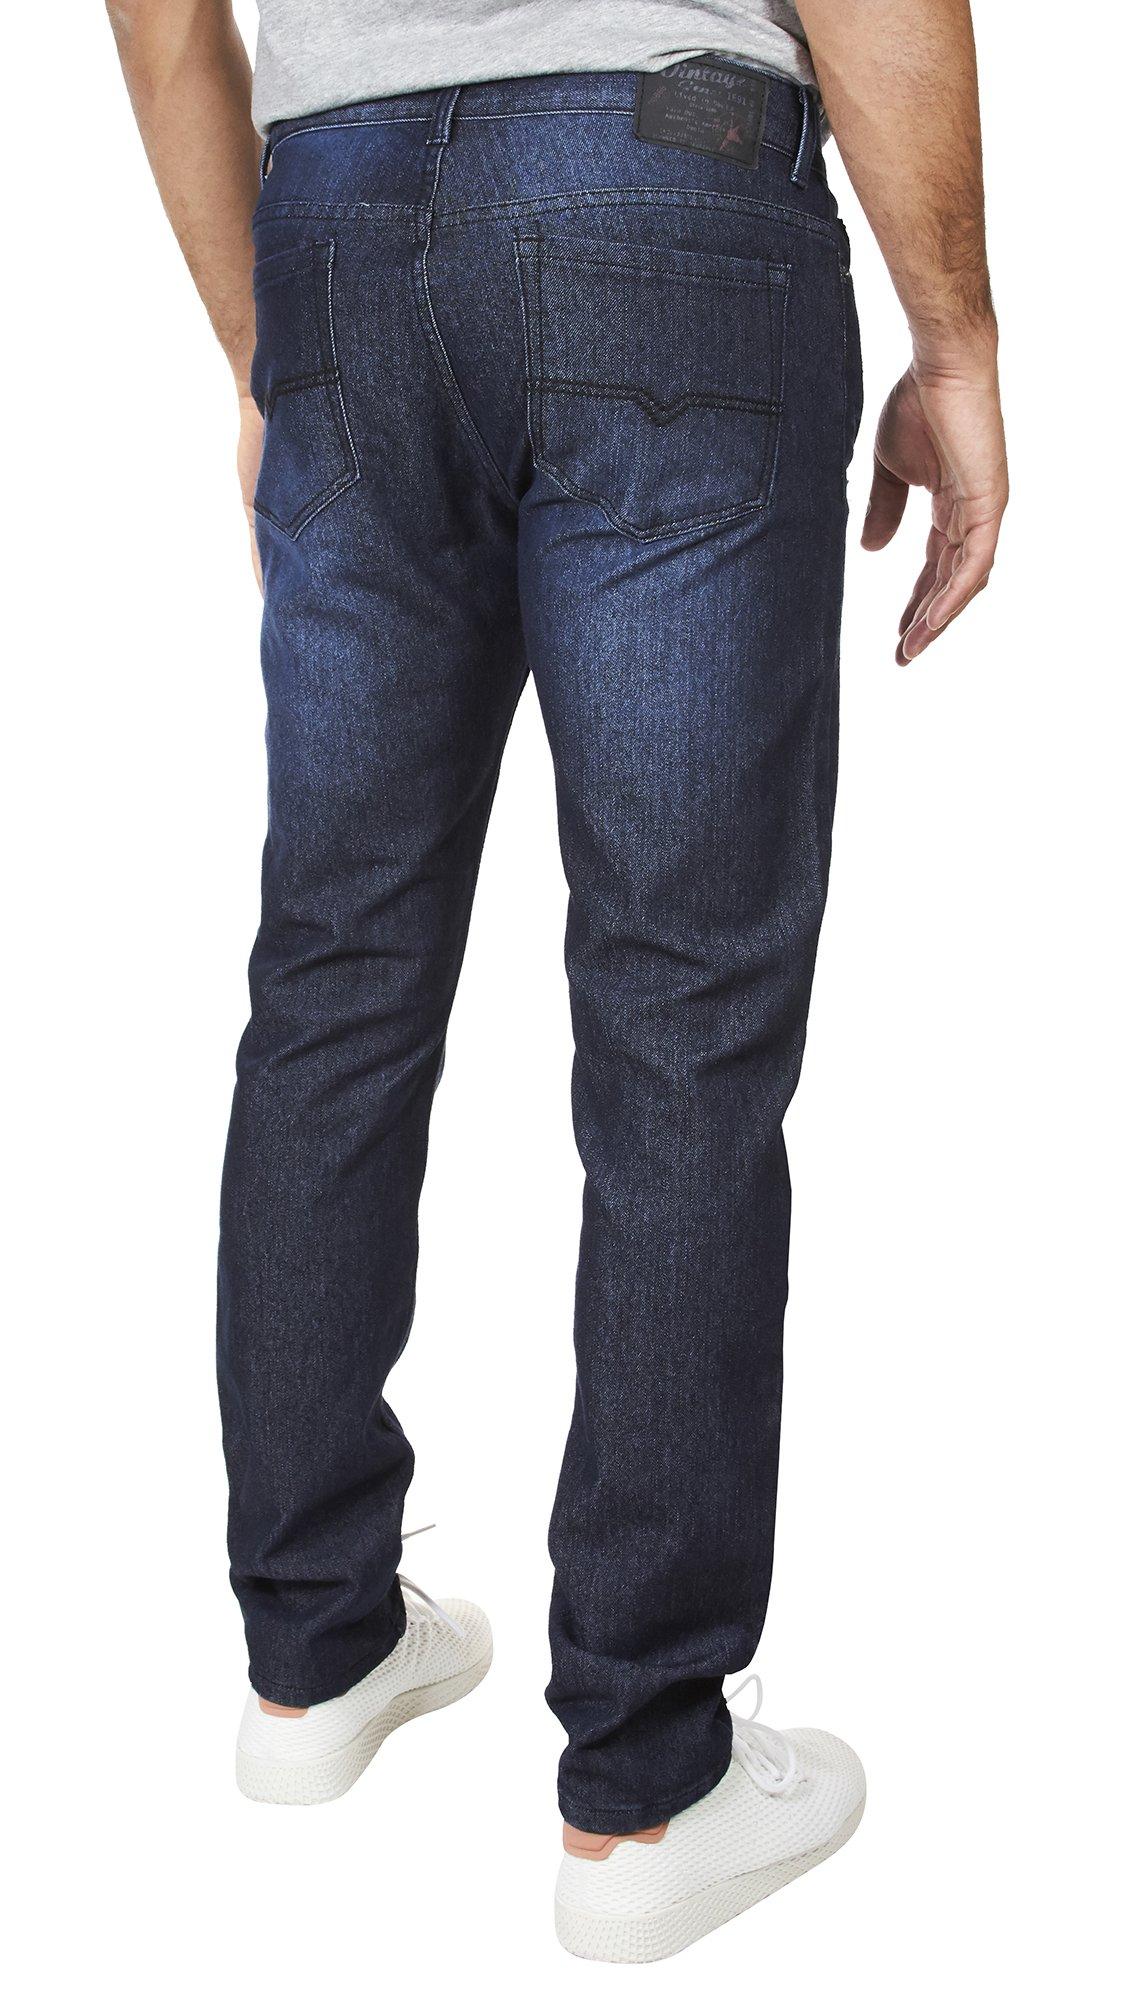 VINTAGE GENES 1899 Mens Stretch Slim Washed Denim Jeans Blue Wrinkle 36X32 by VINTAGE GENES (Image #3)